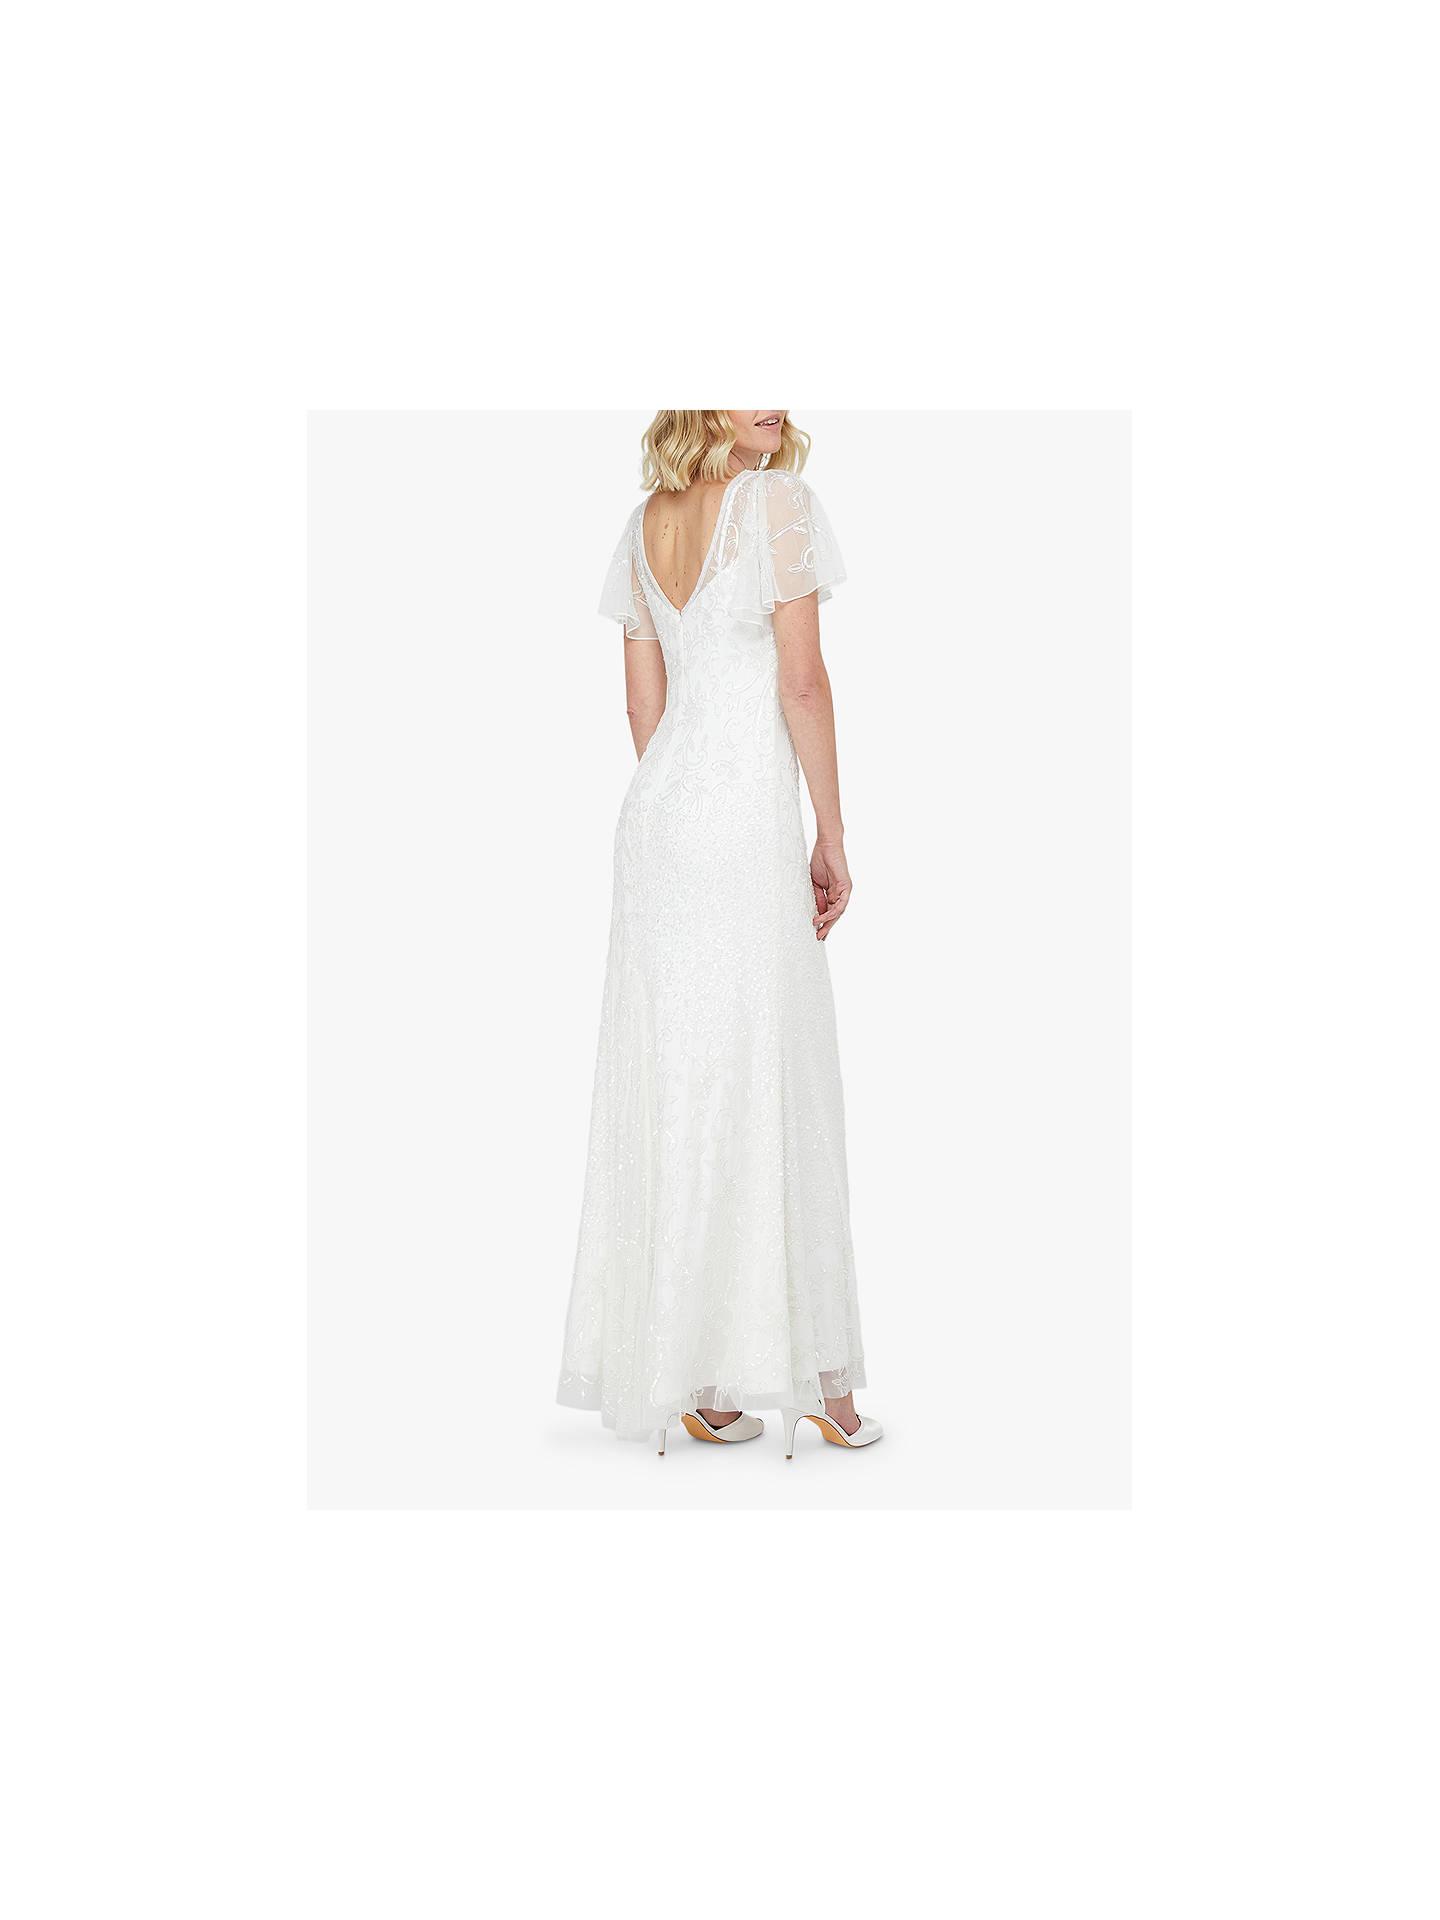 Monsoon Kitty Bridal Embellished Maxi Dress Ivory At John Lewis Partners,Long Indian Dresses For Weddings